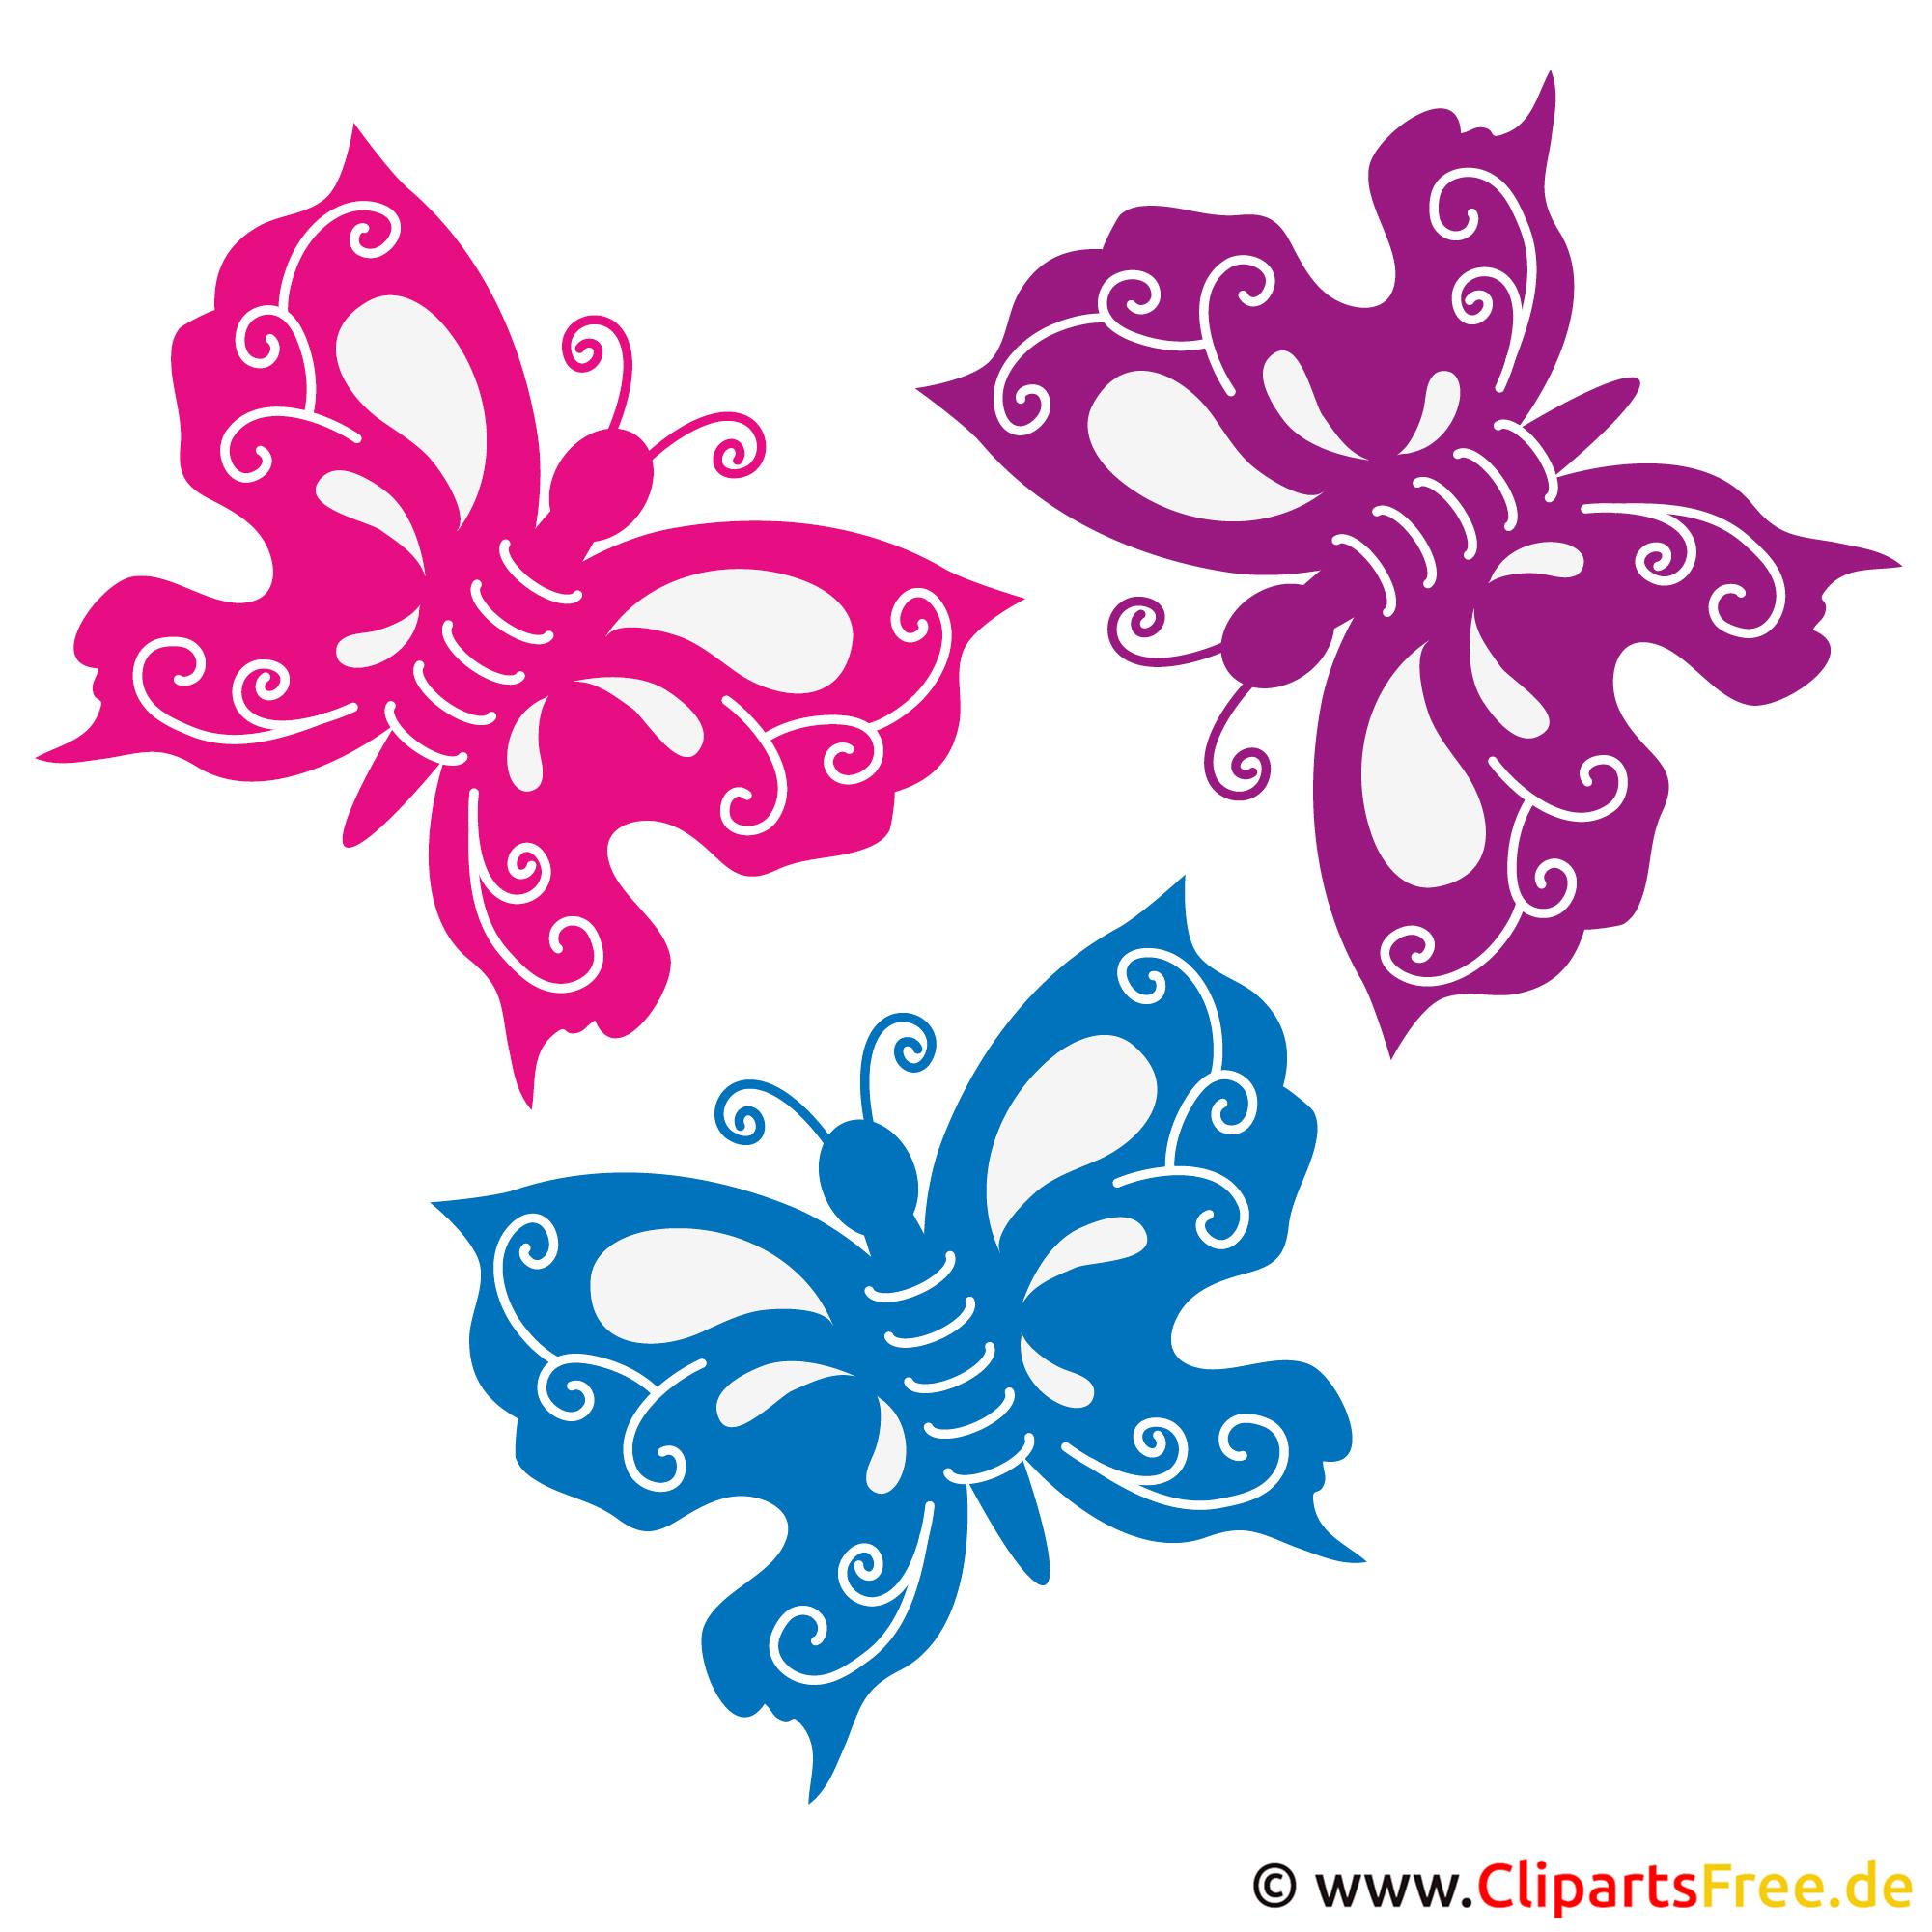 Bunte Schmetterlinge Bild Sommer Bilder Gratis